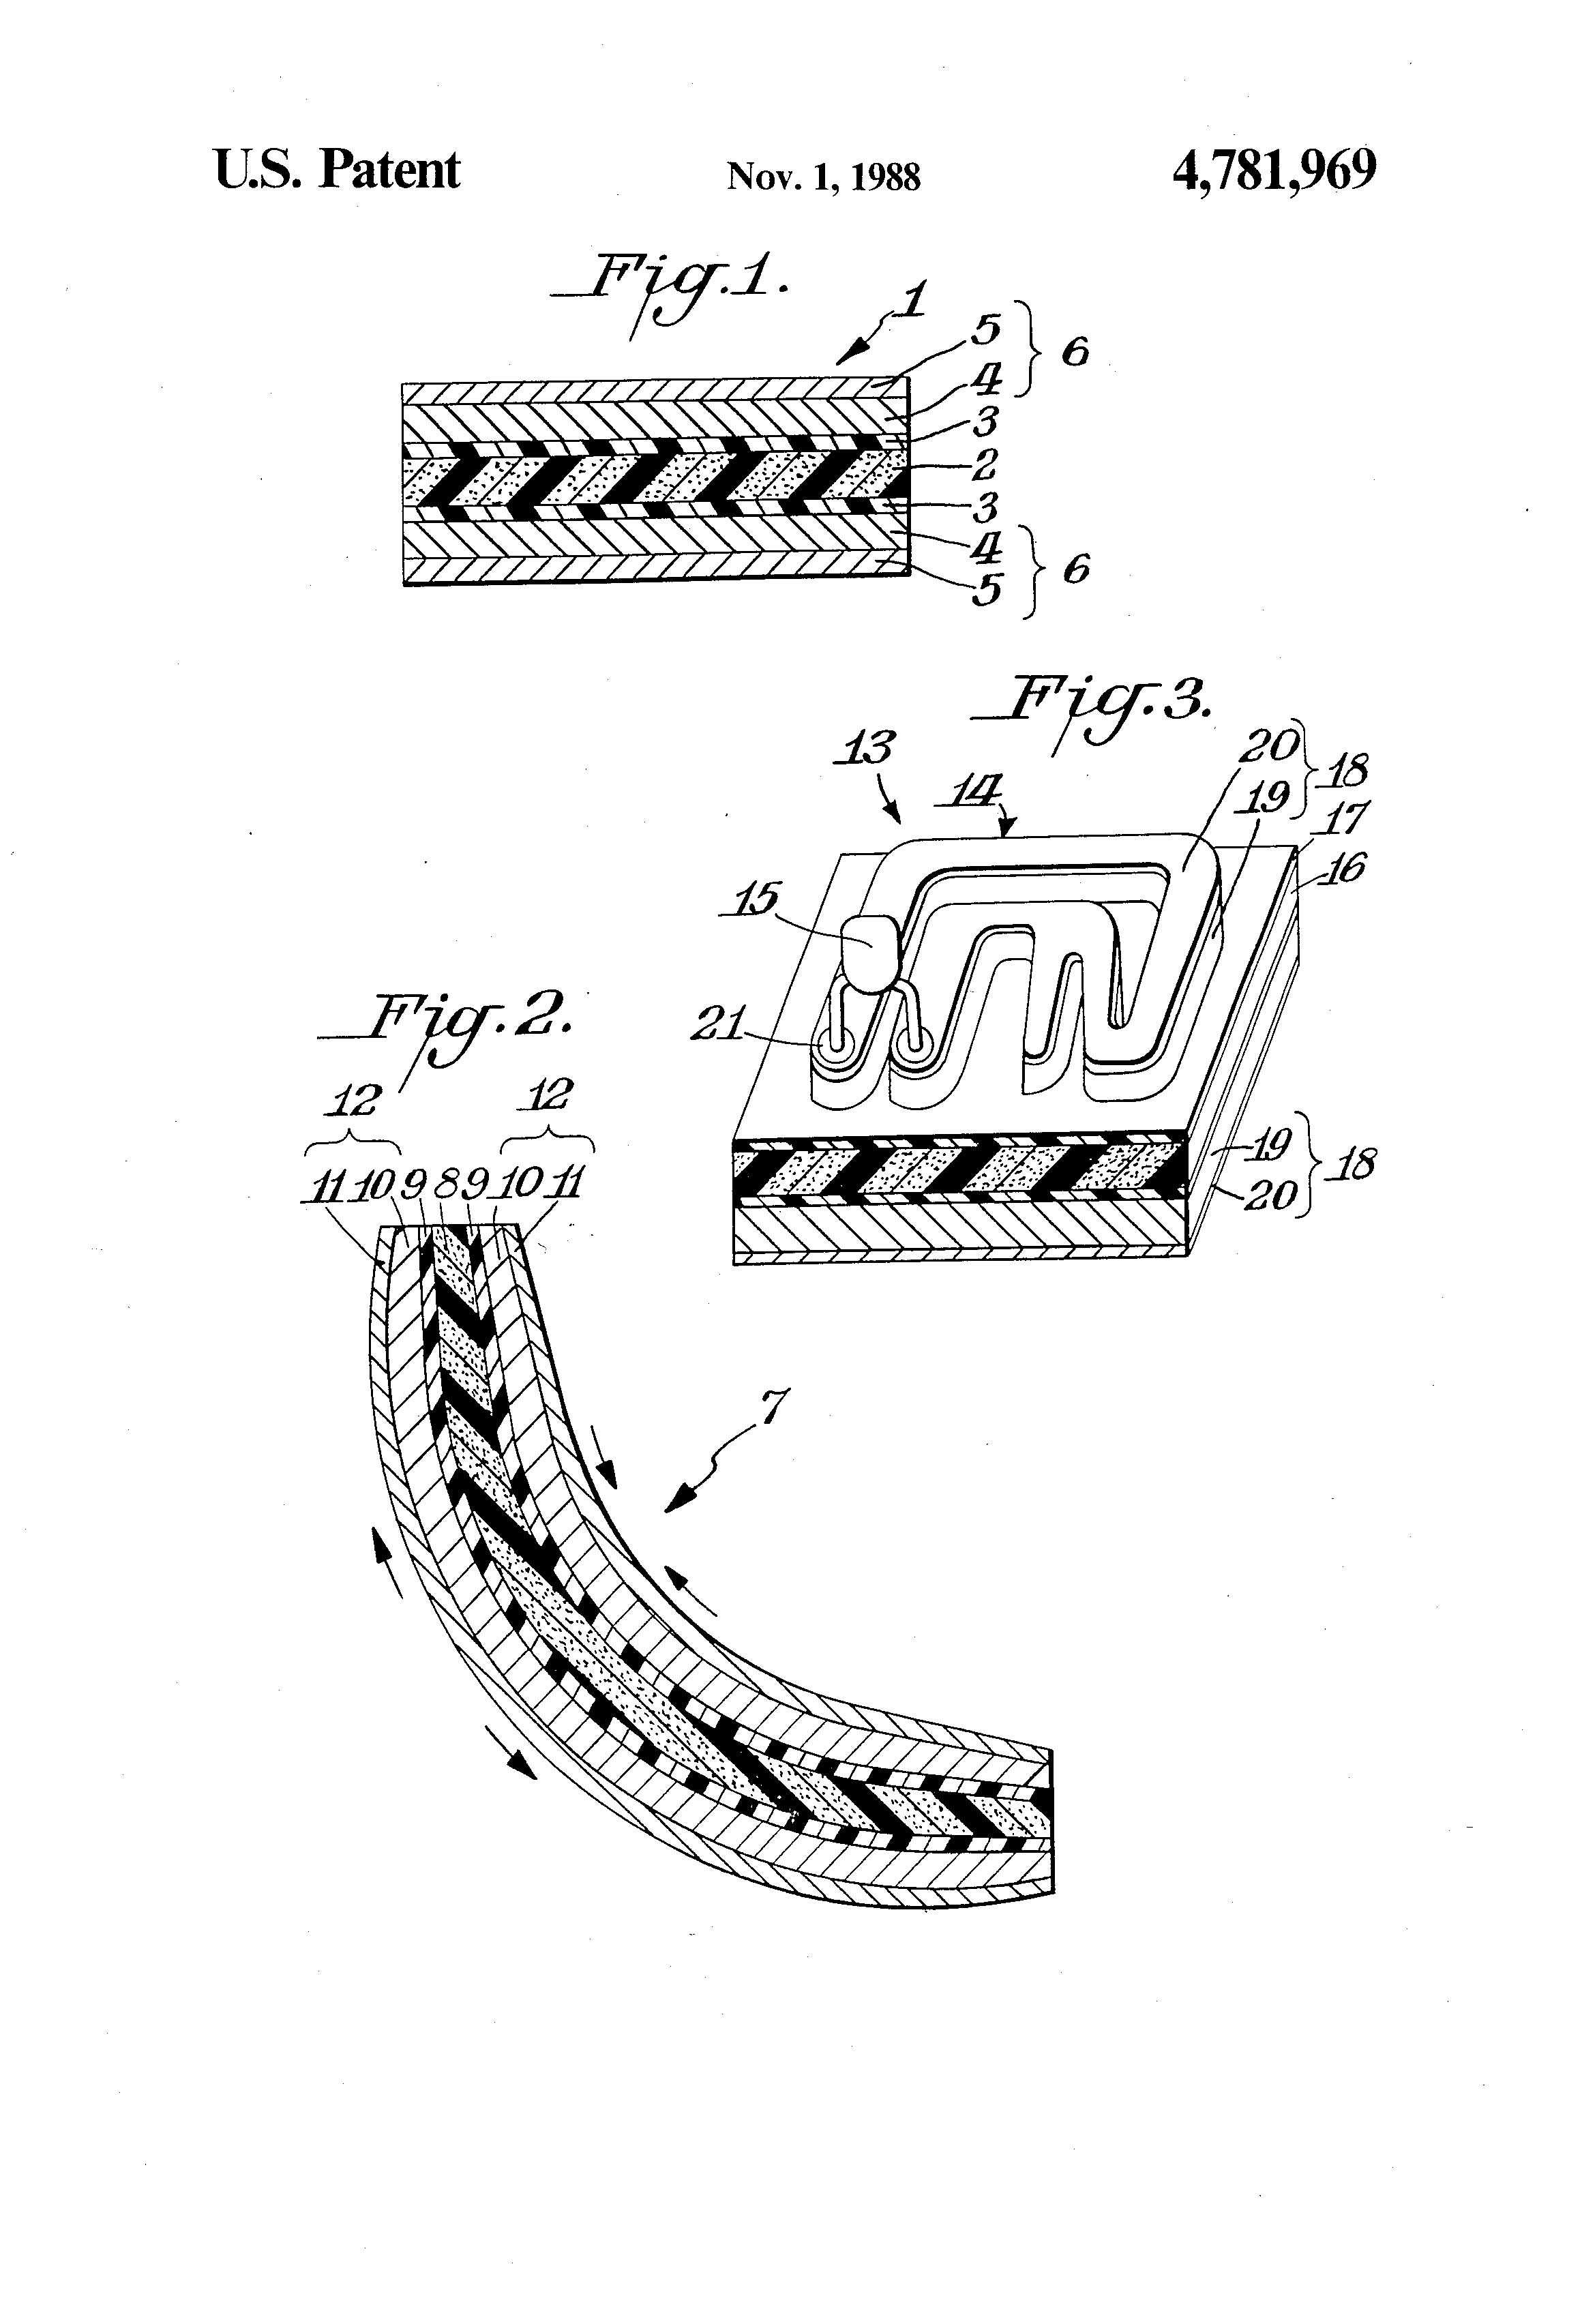 patente us4781969